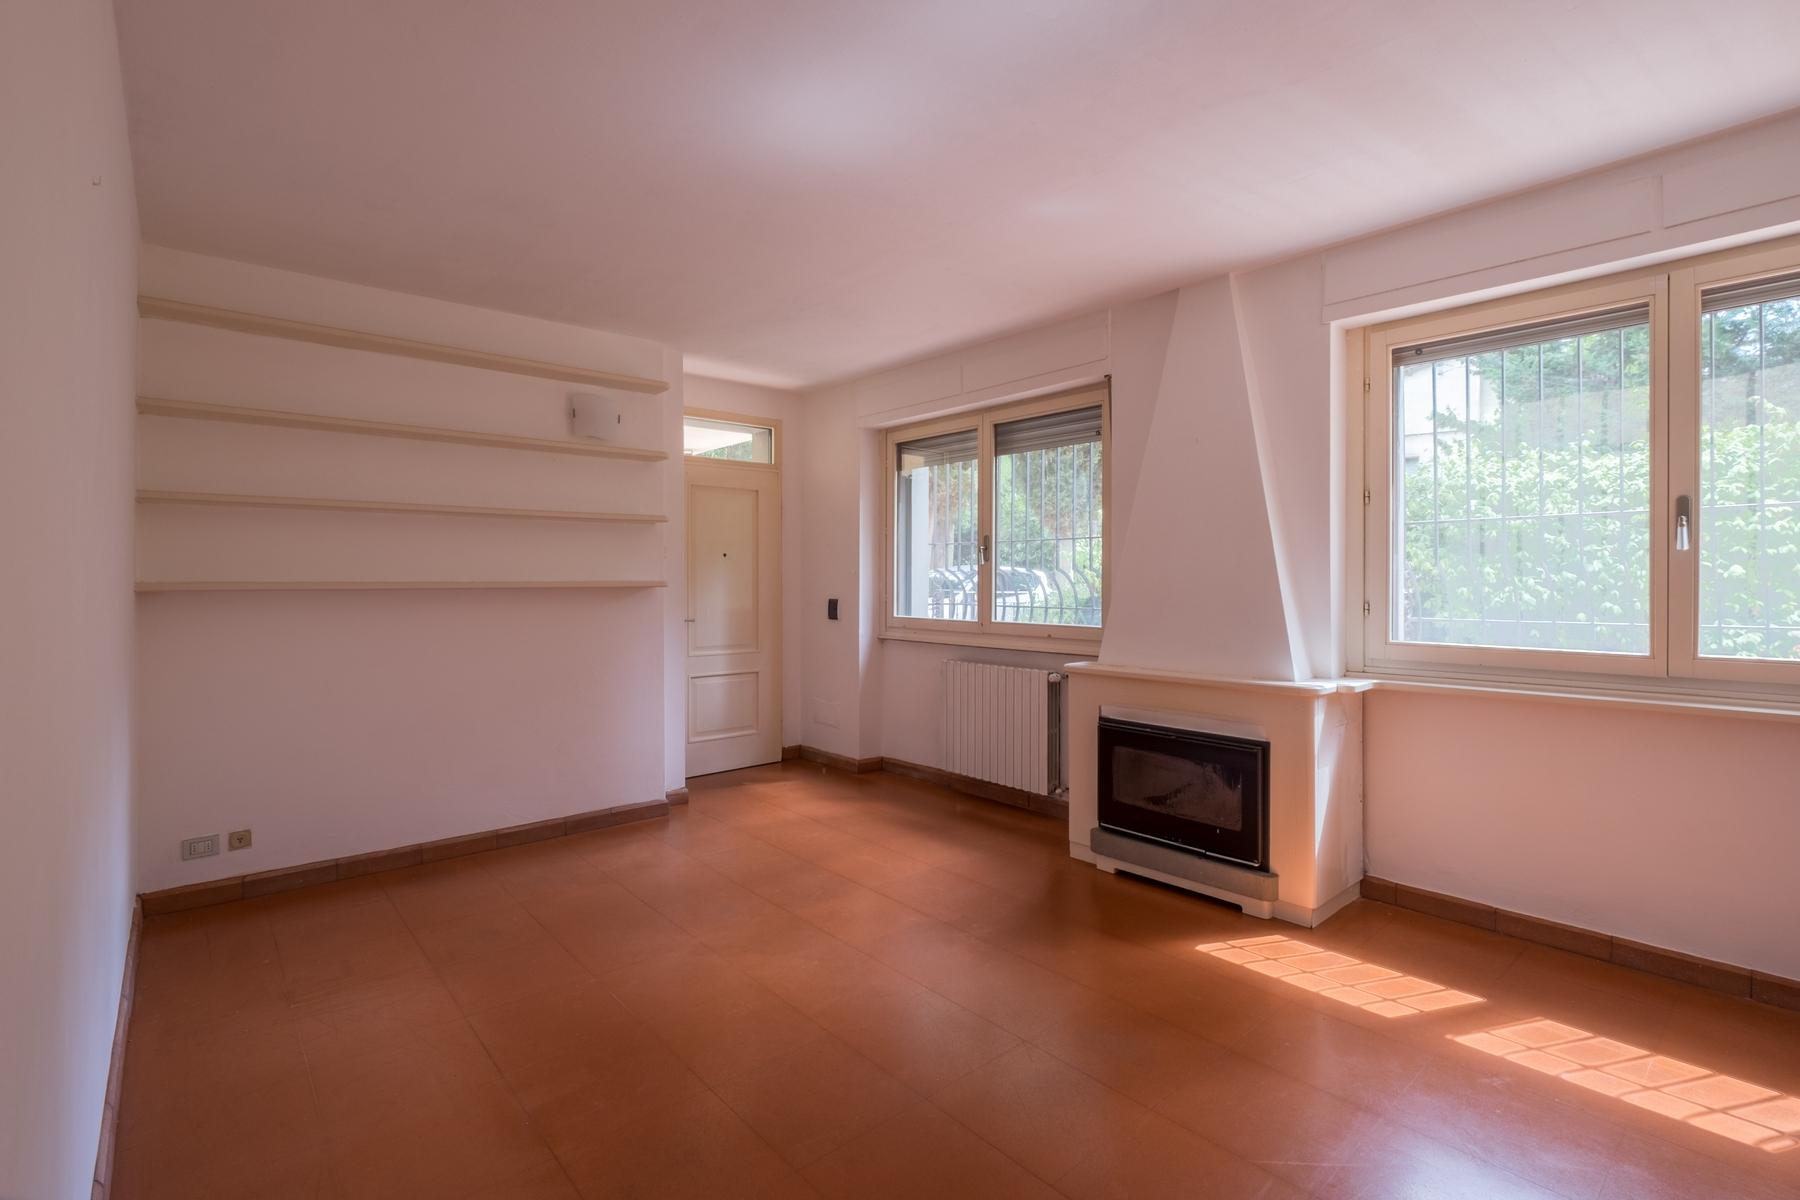 Lovely apartment in exclusive Poggio Imperiale area - 6